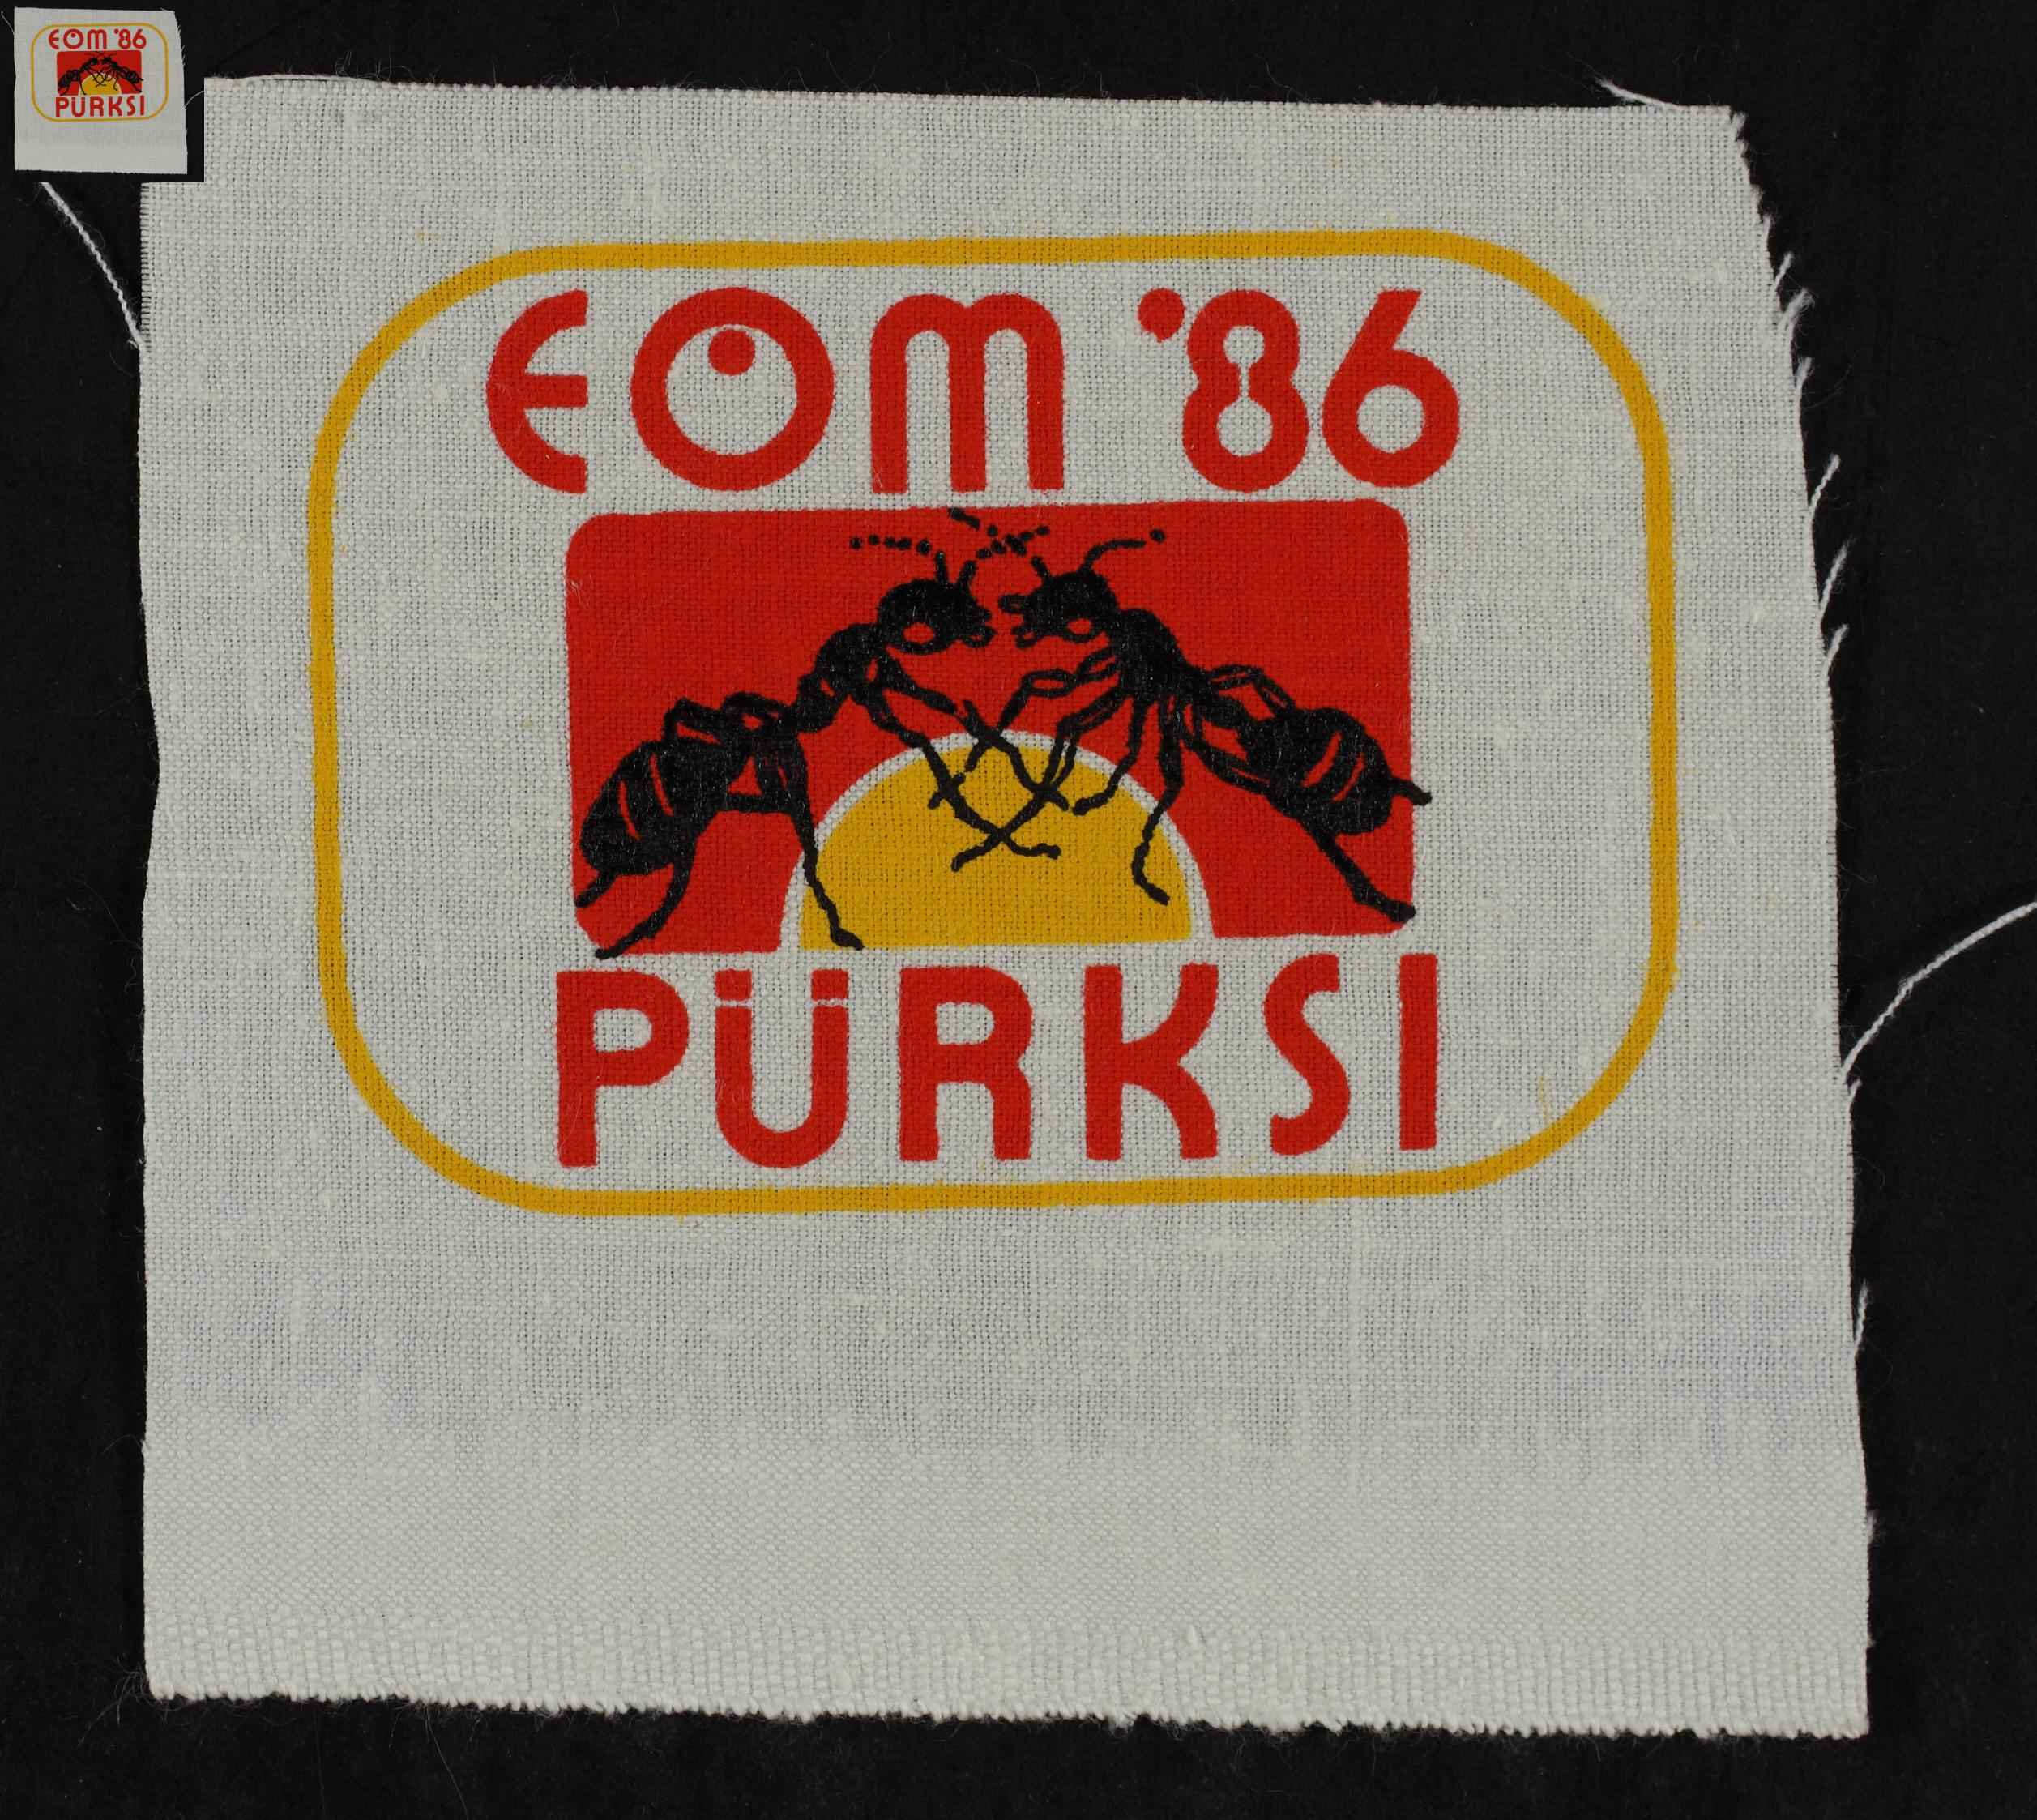 Maleva embleem, Pürksi 1986 / Secondary School Students' Building Brigade emblem, Pürksi 1986